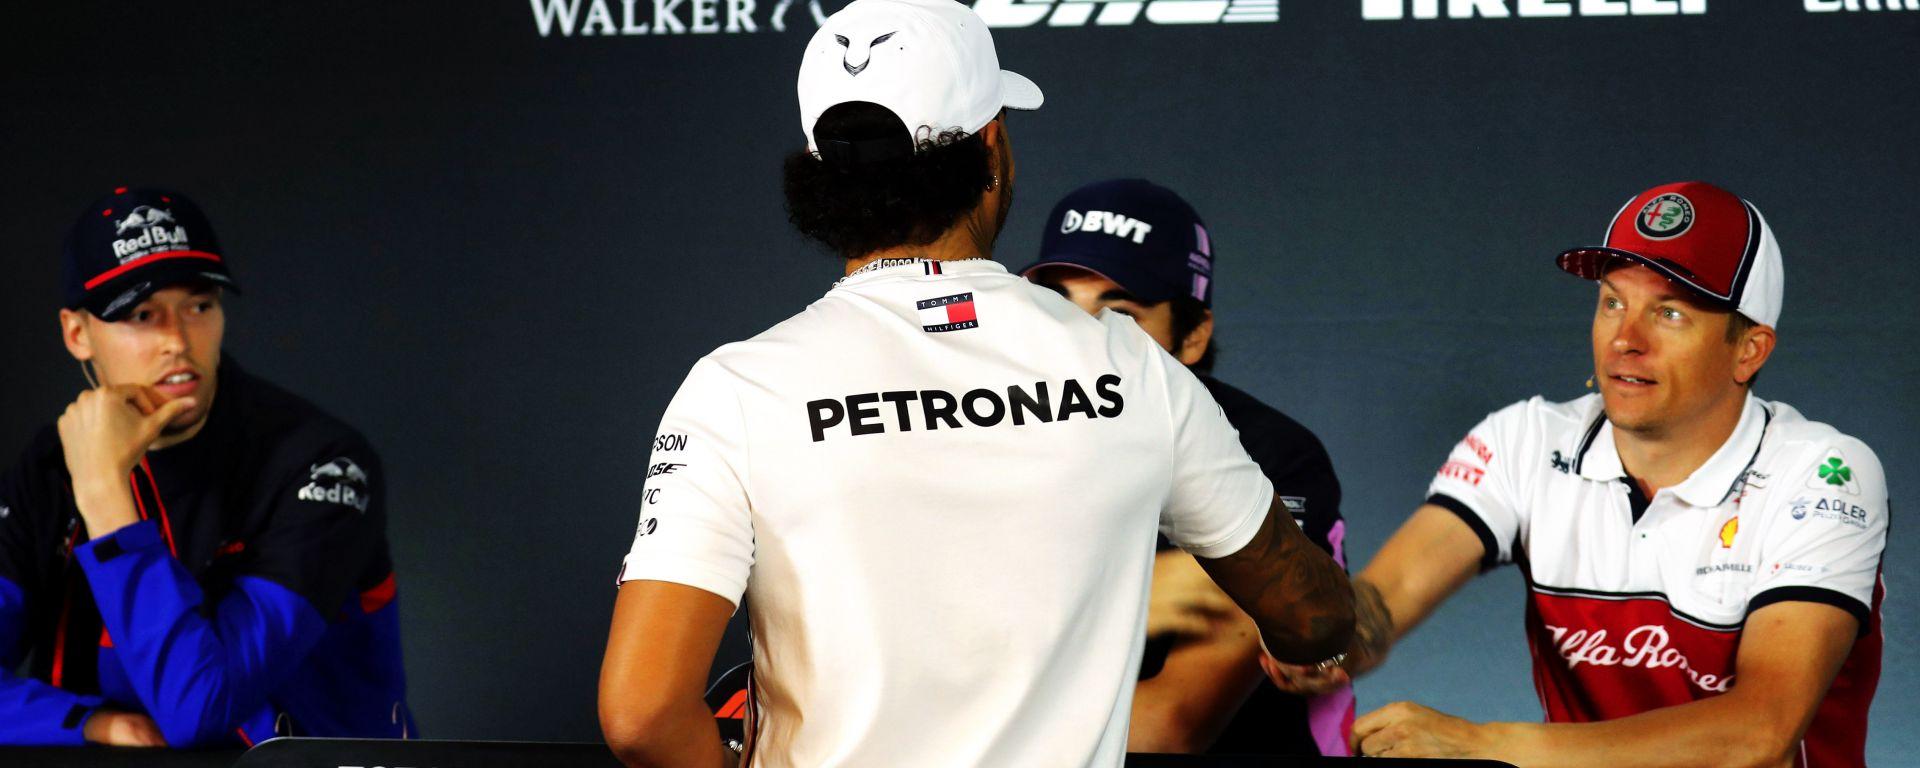 F1, GP Canada 2019: Lewis Hamilton (Mercedes) stringe la mano a Kimi Raikkonen (Alfa Romeo)